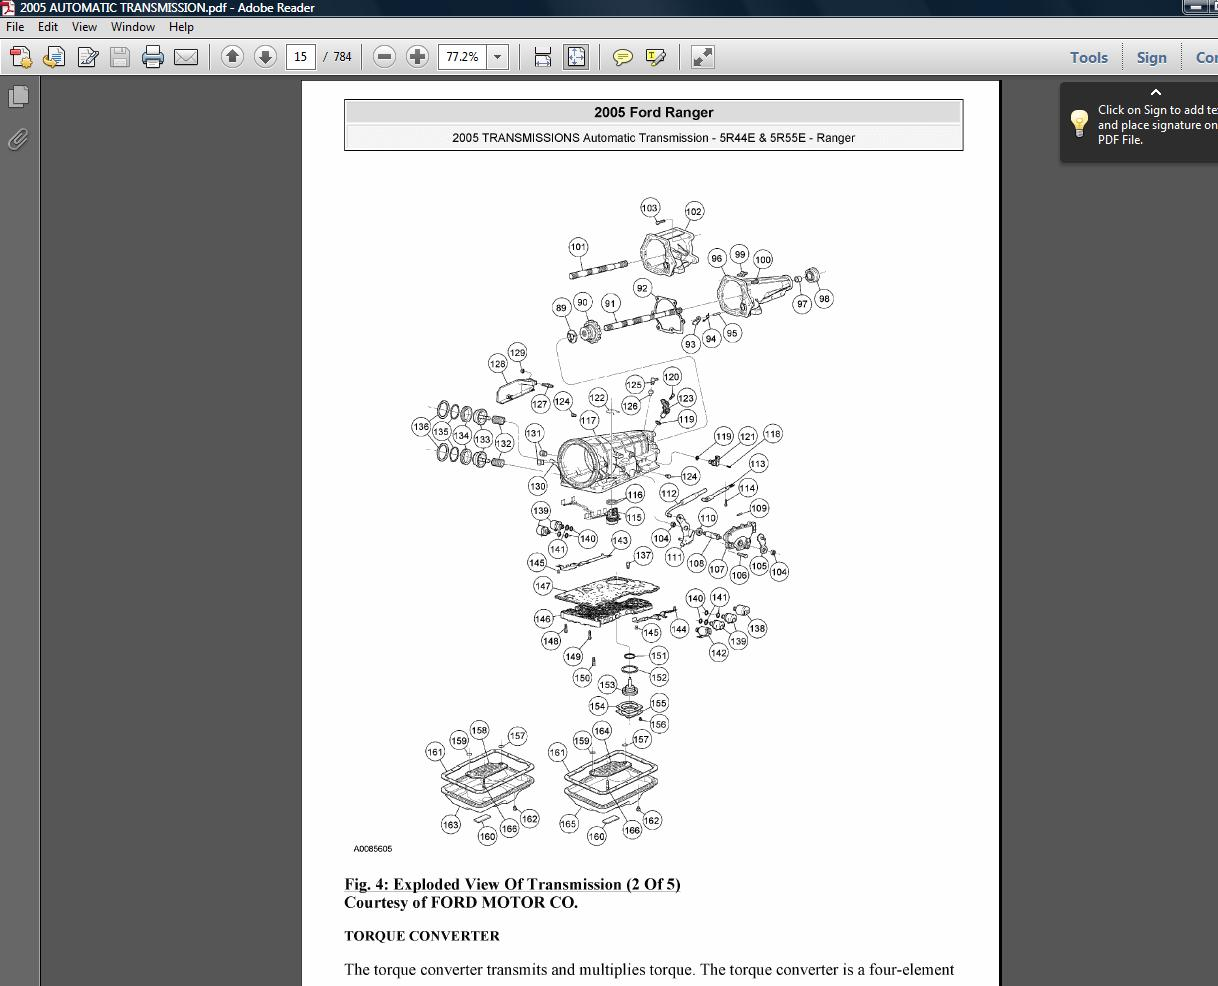 2001 02 03 04 05 06 07 08 5r44e 5r55e ford ranger automatic transmission pdf manual download [ 1218 x 986 Pixel ]